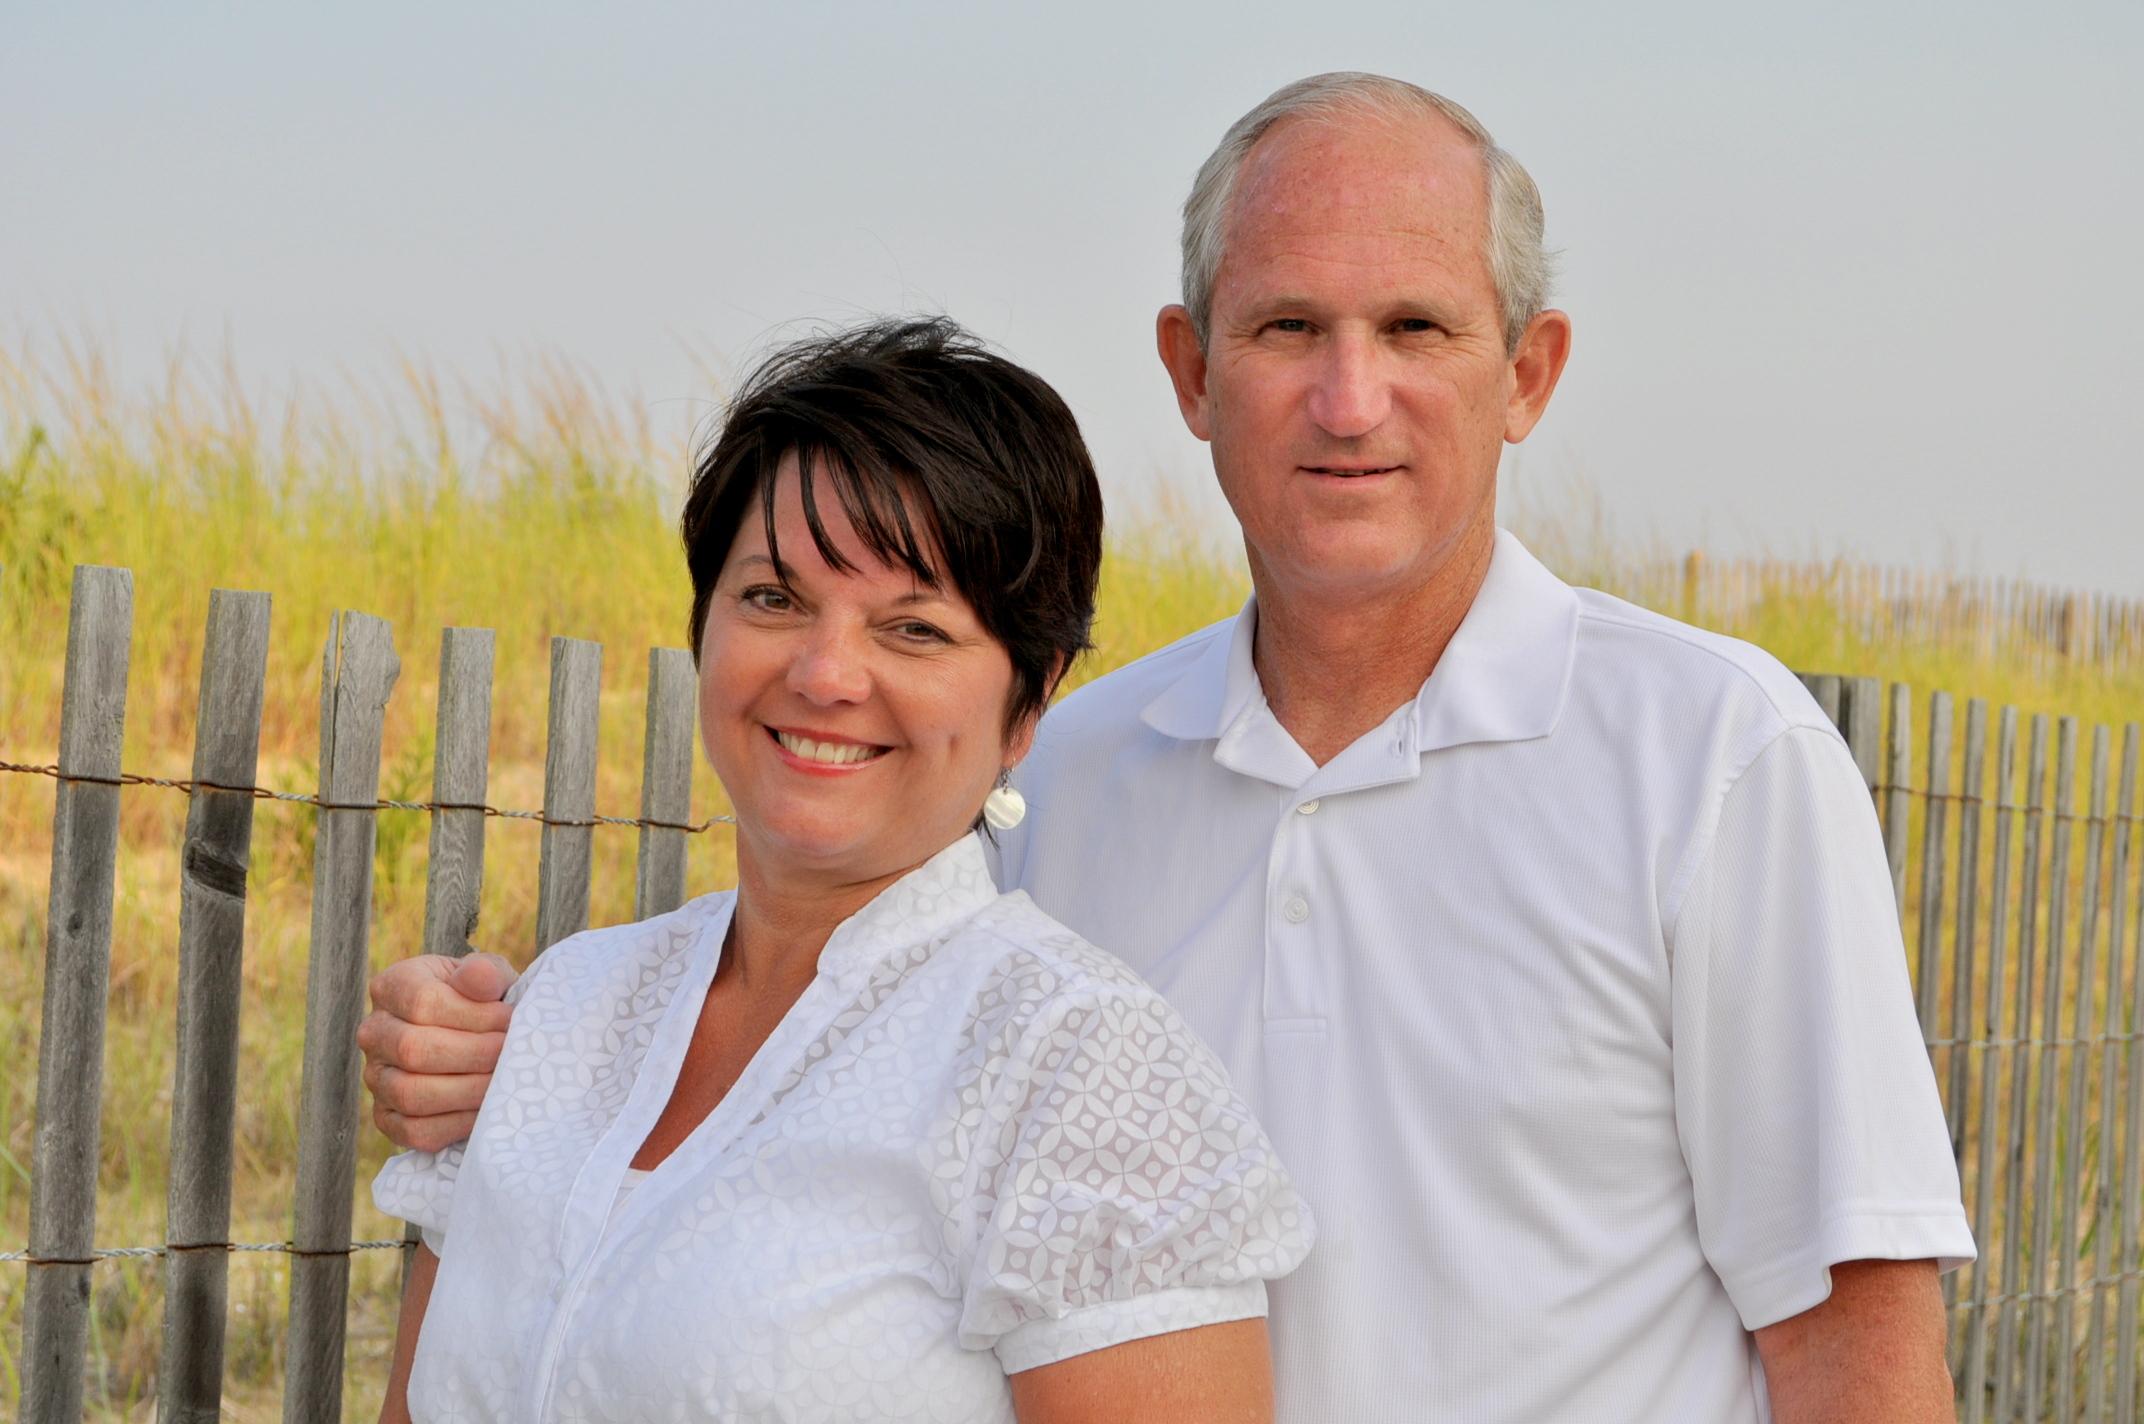 Greg and Dawn Sanford